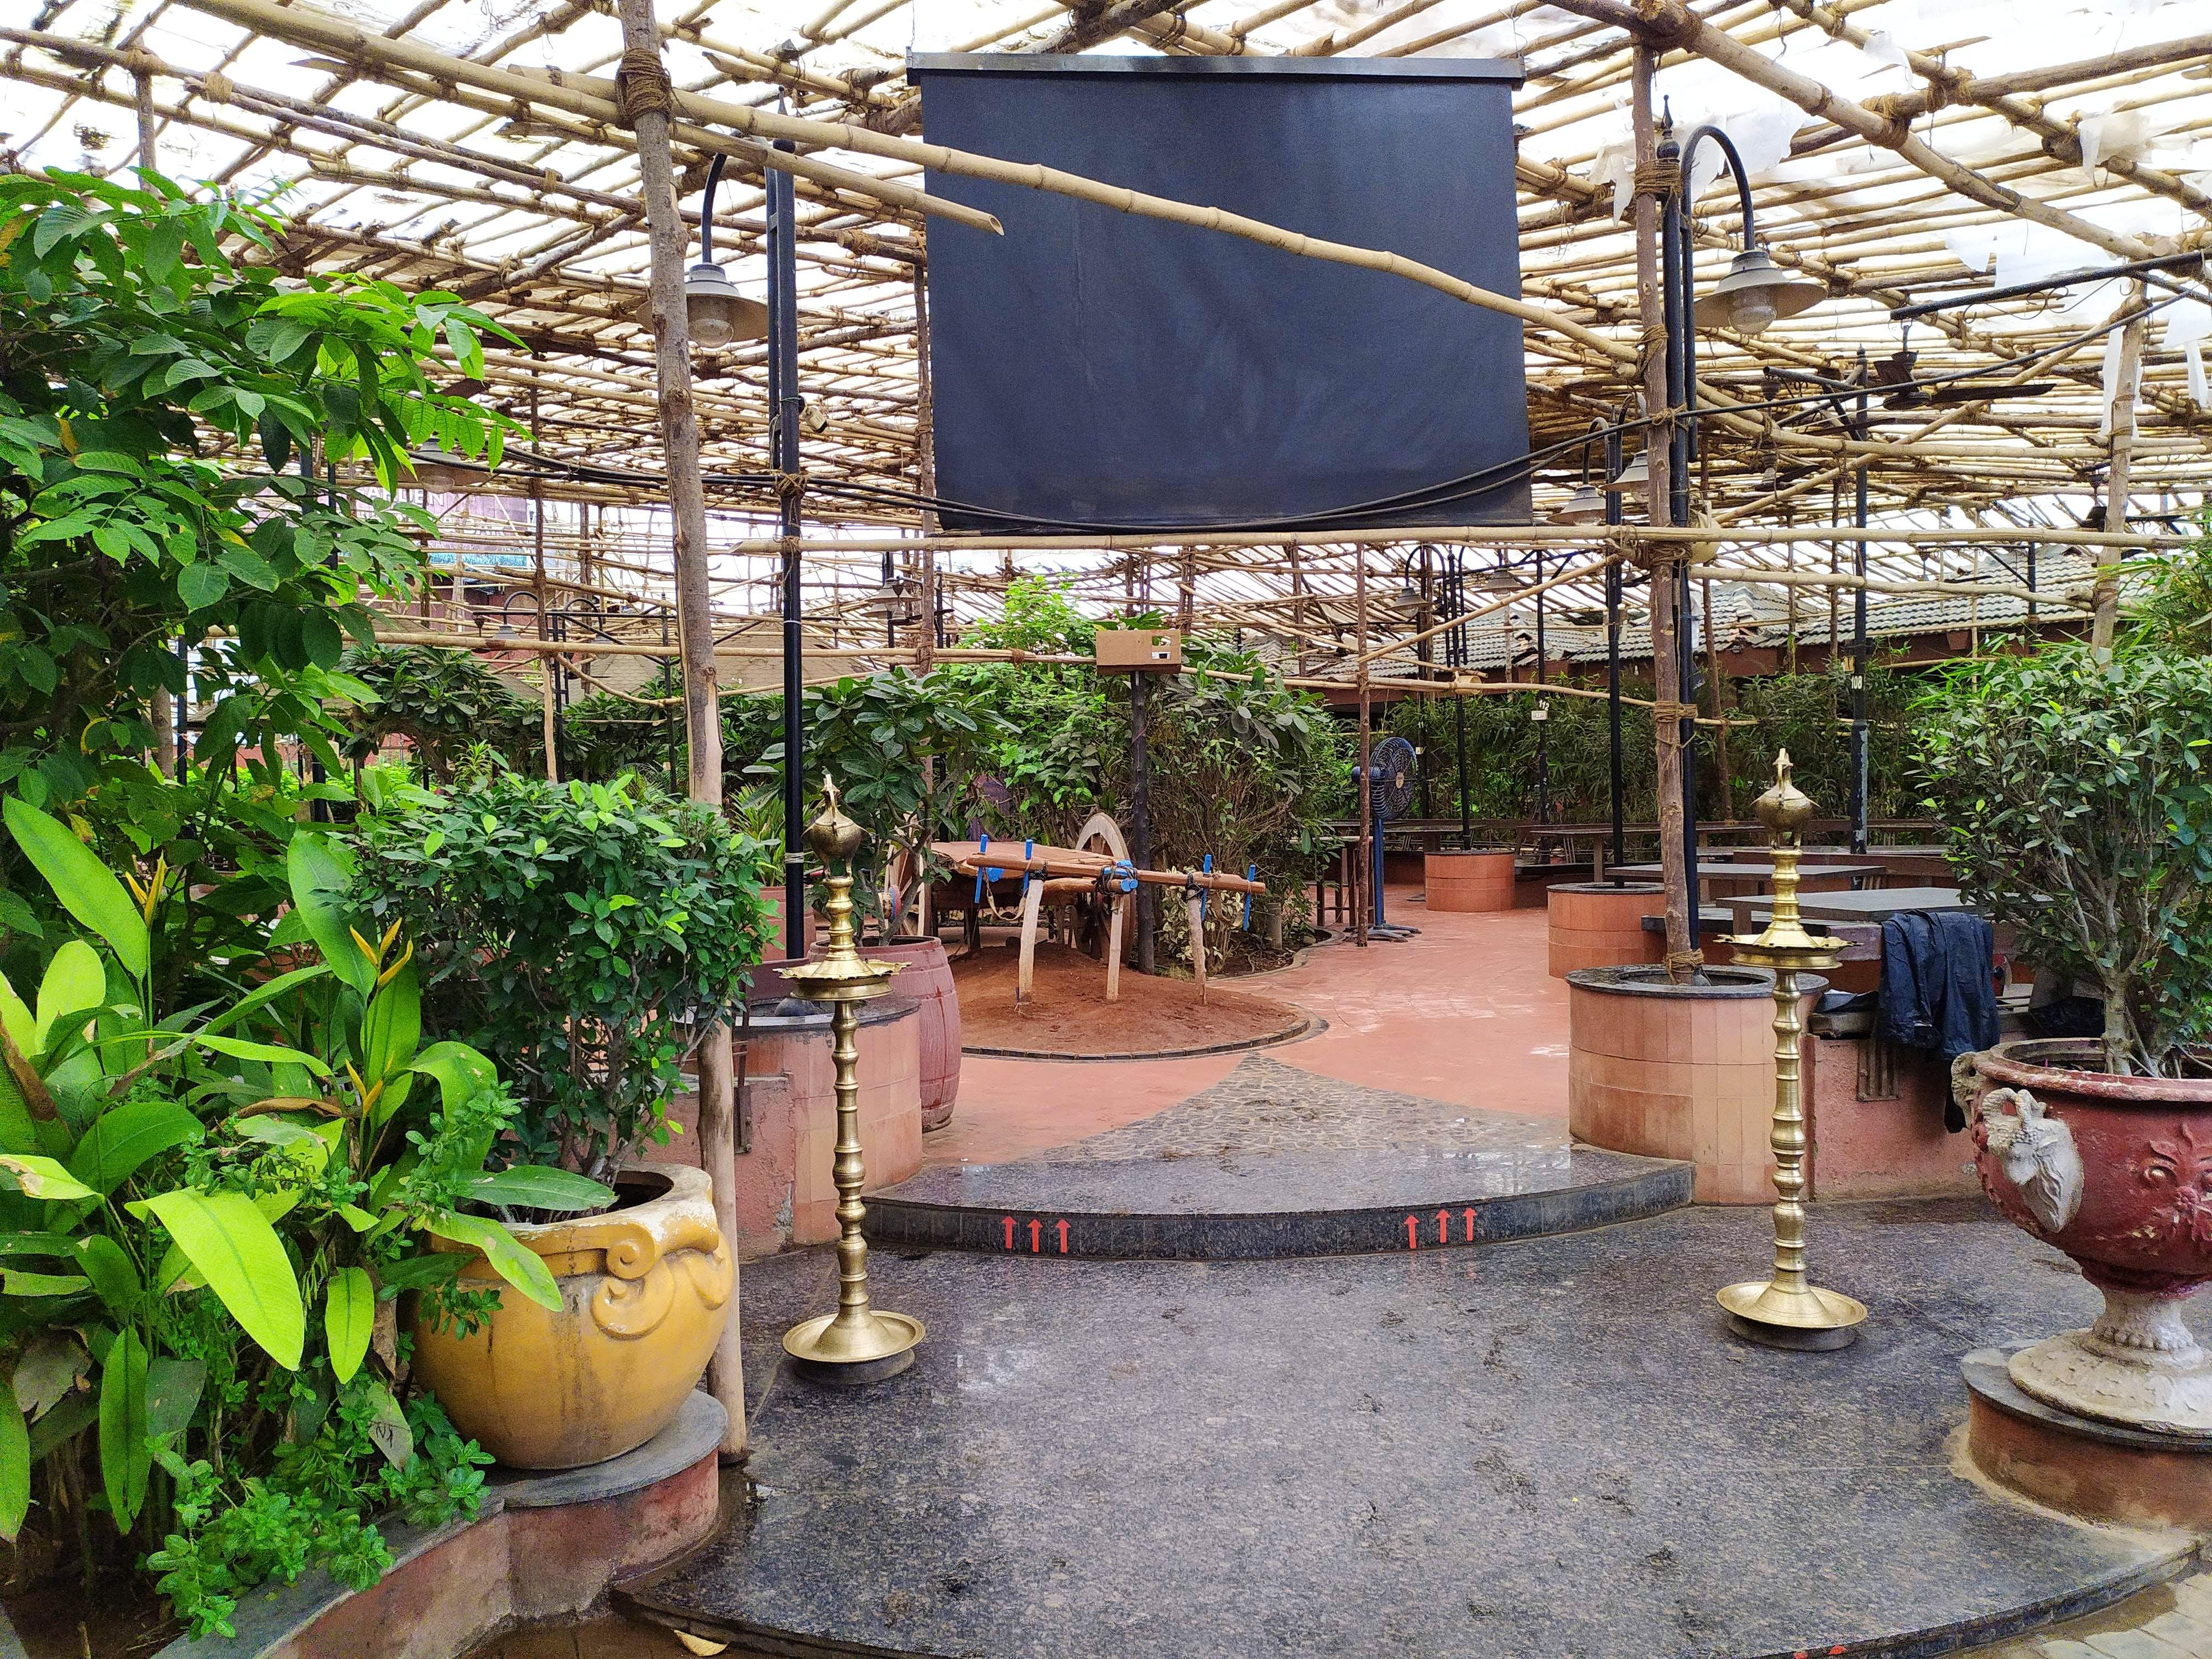 Greenhouse,Botany,Building,Garden,Plant,Backyard,Houseplant,Shade